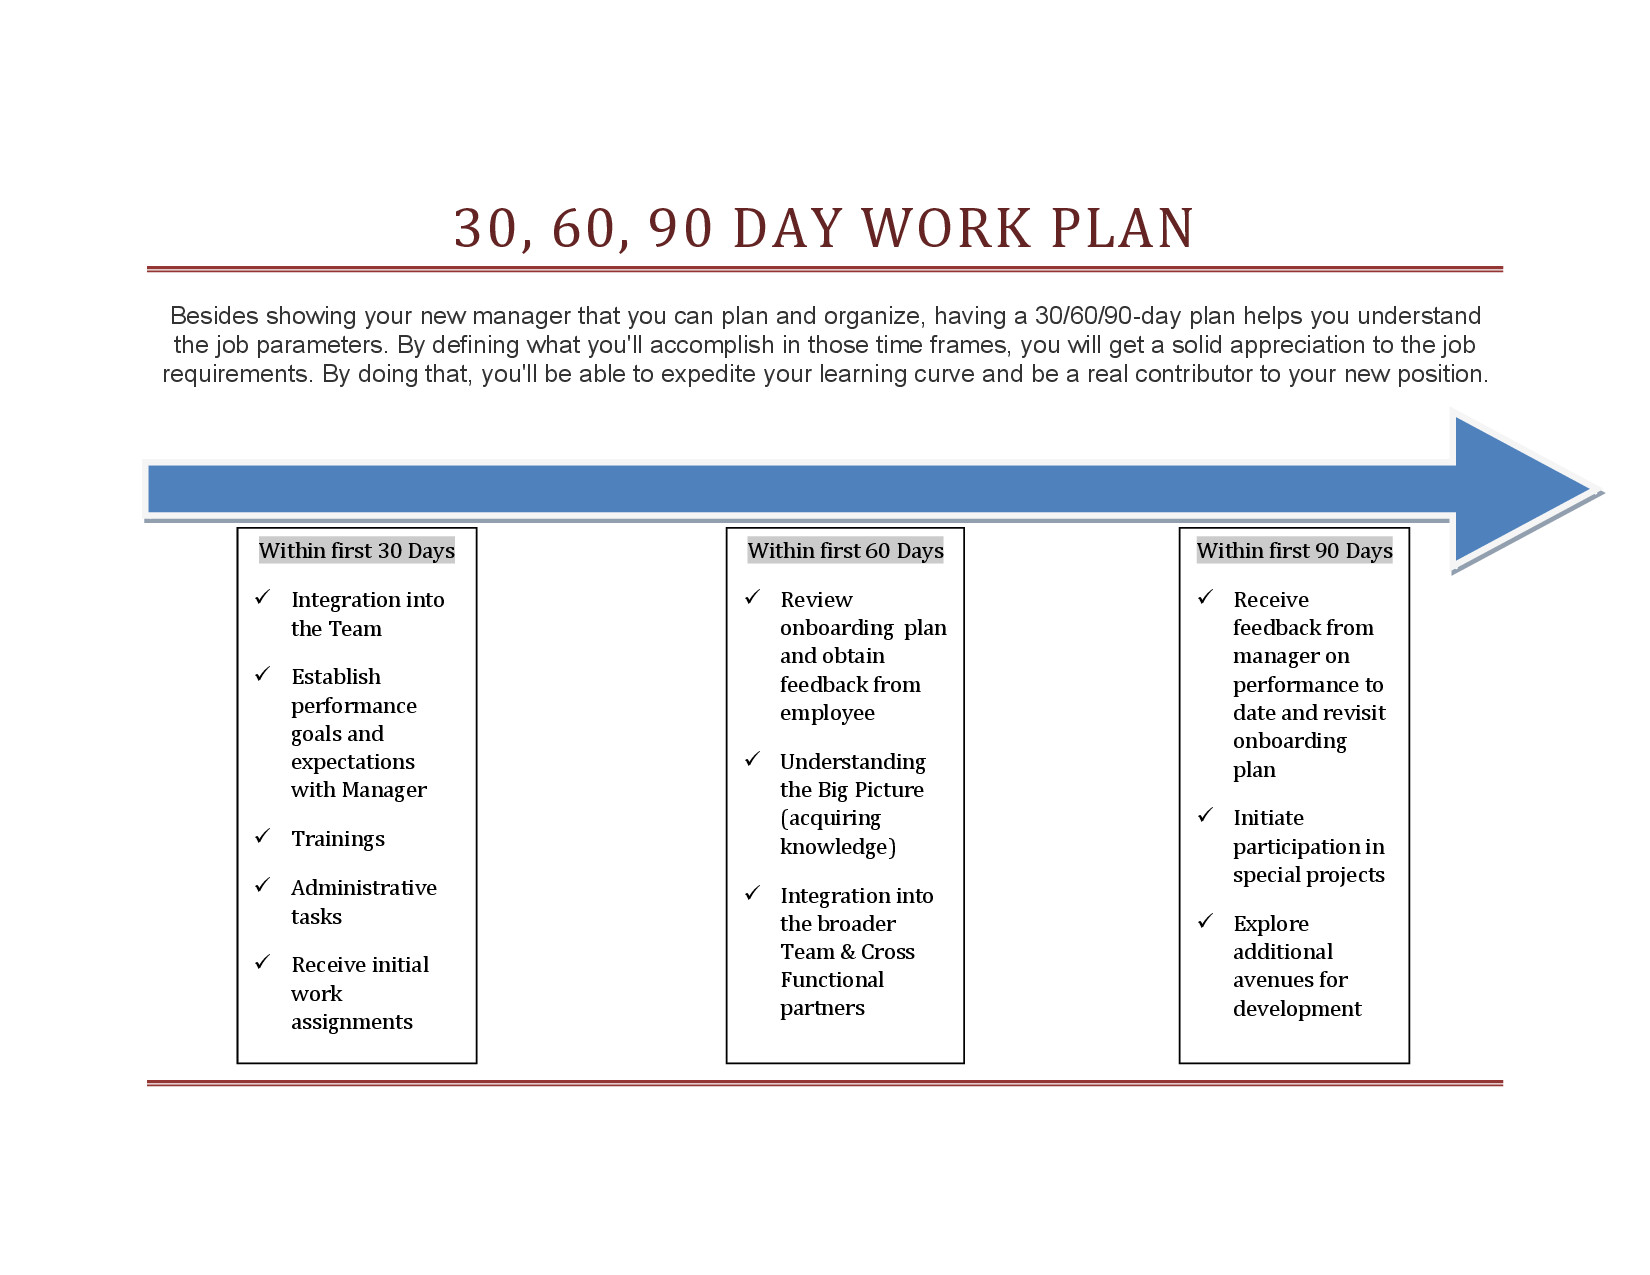 First 90 Days Plan Template 30 60 90 Day Work Plan Templatepdf by Tinammckenna